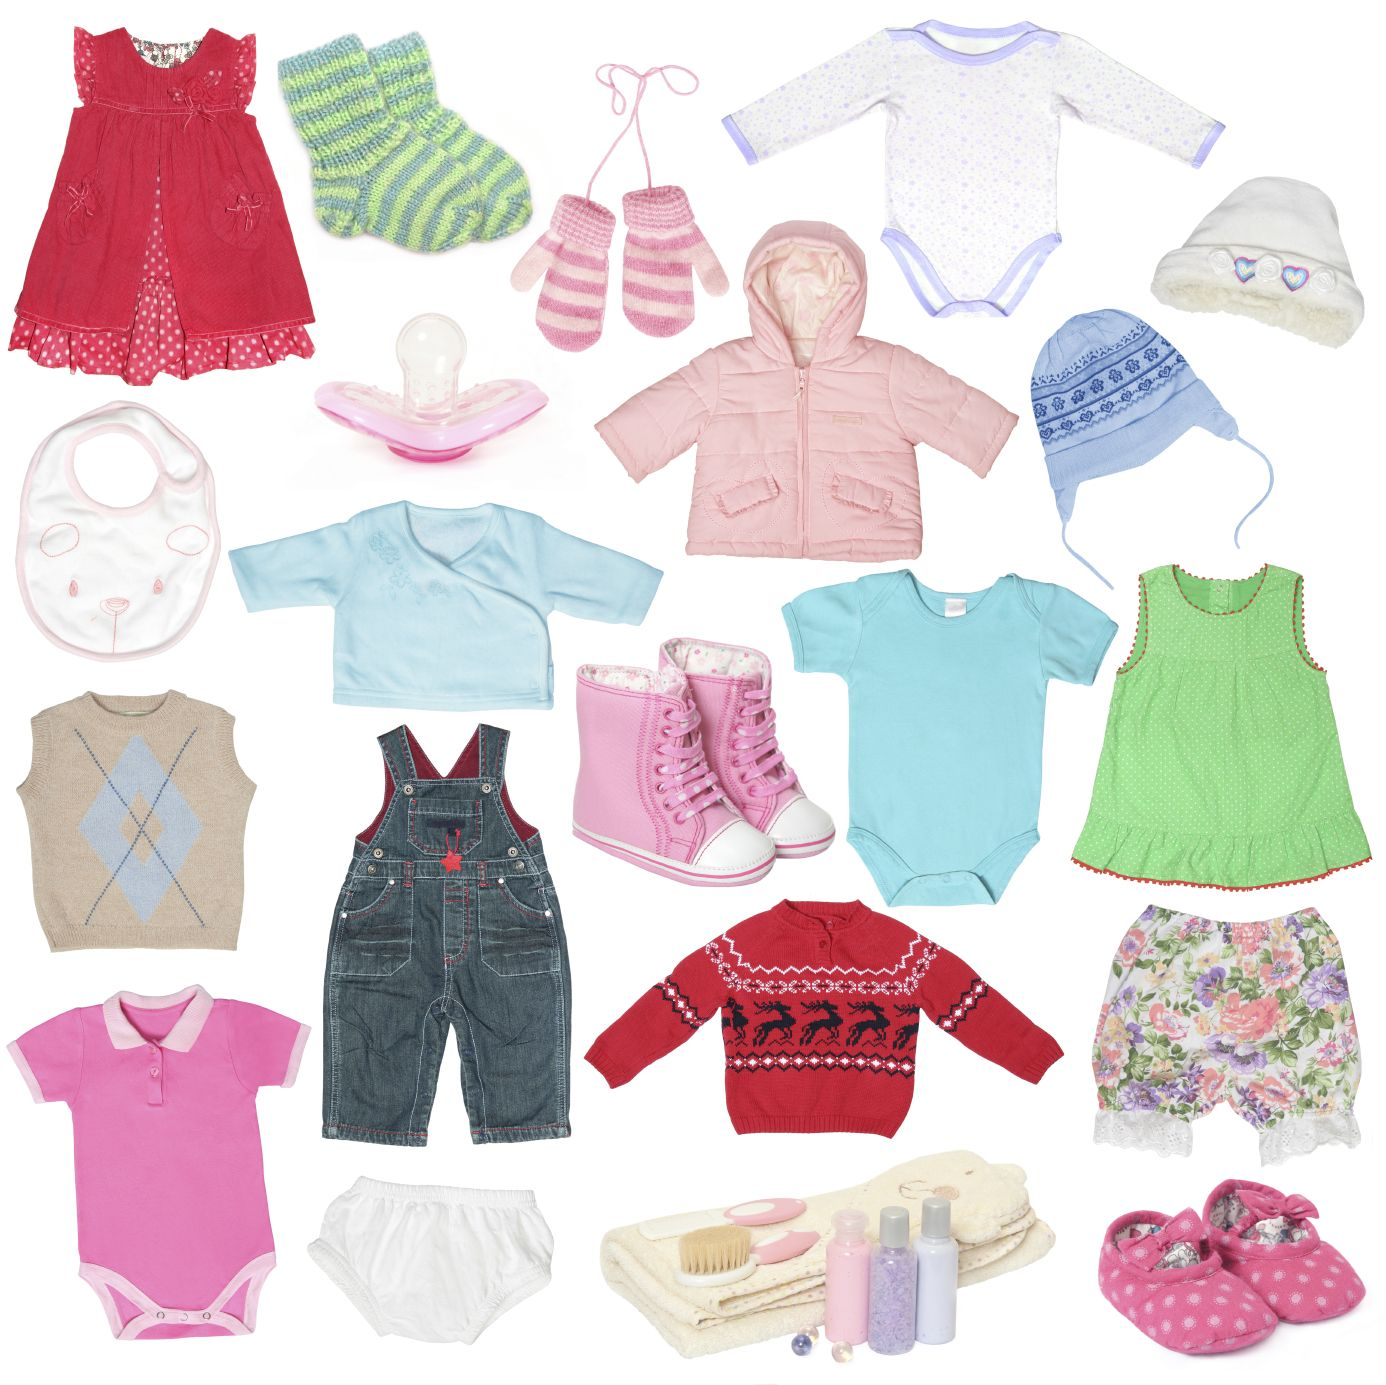 2e Hands Kleding.Verkoop 2e Hands Baby Kinderkleding Volwassen Kleding Terschelling